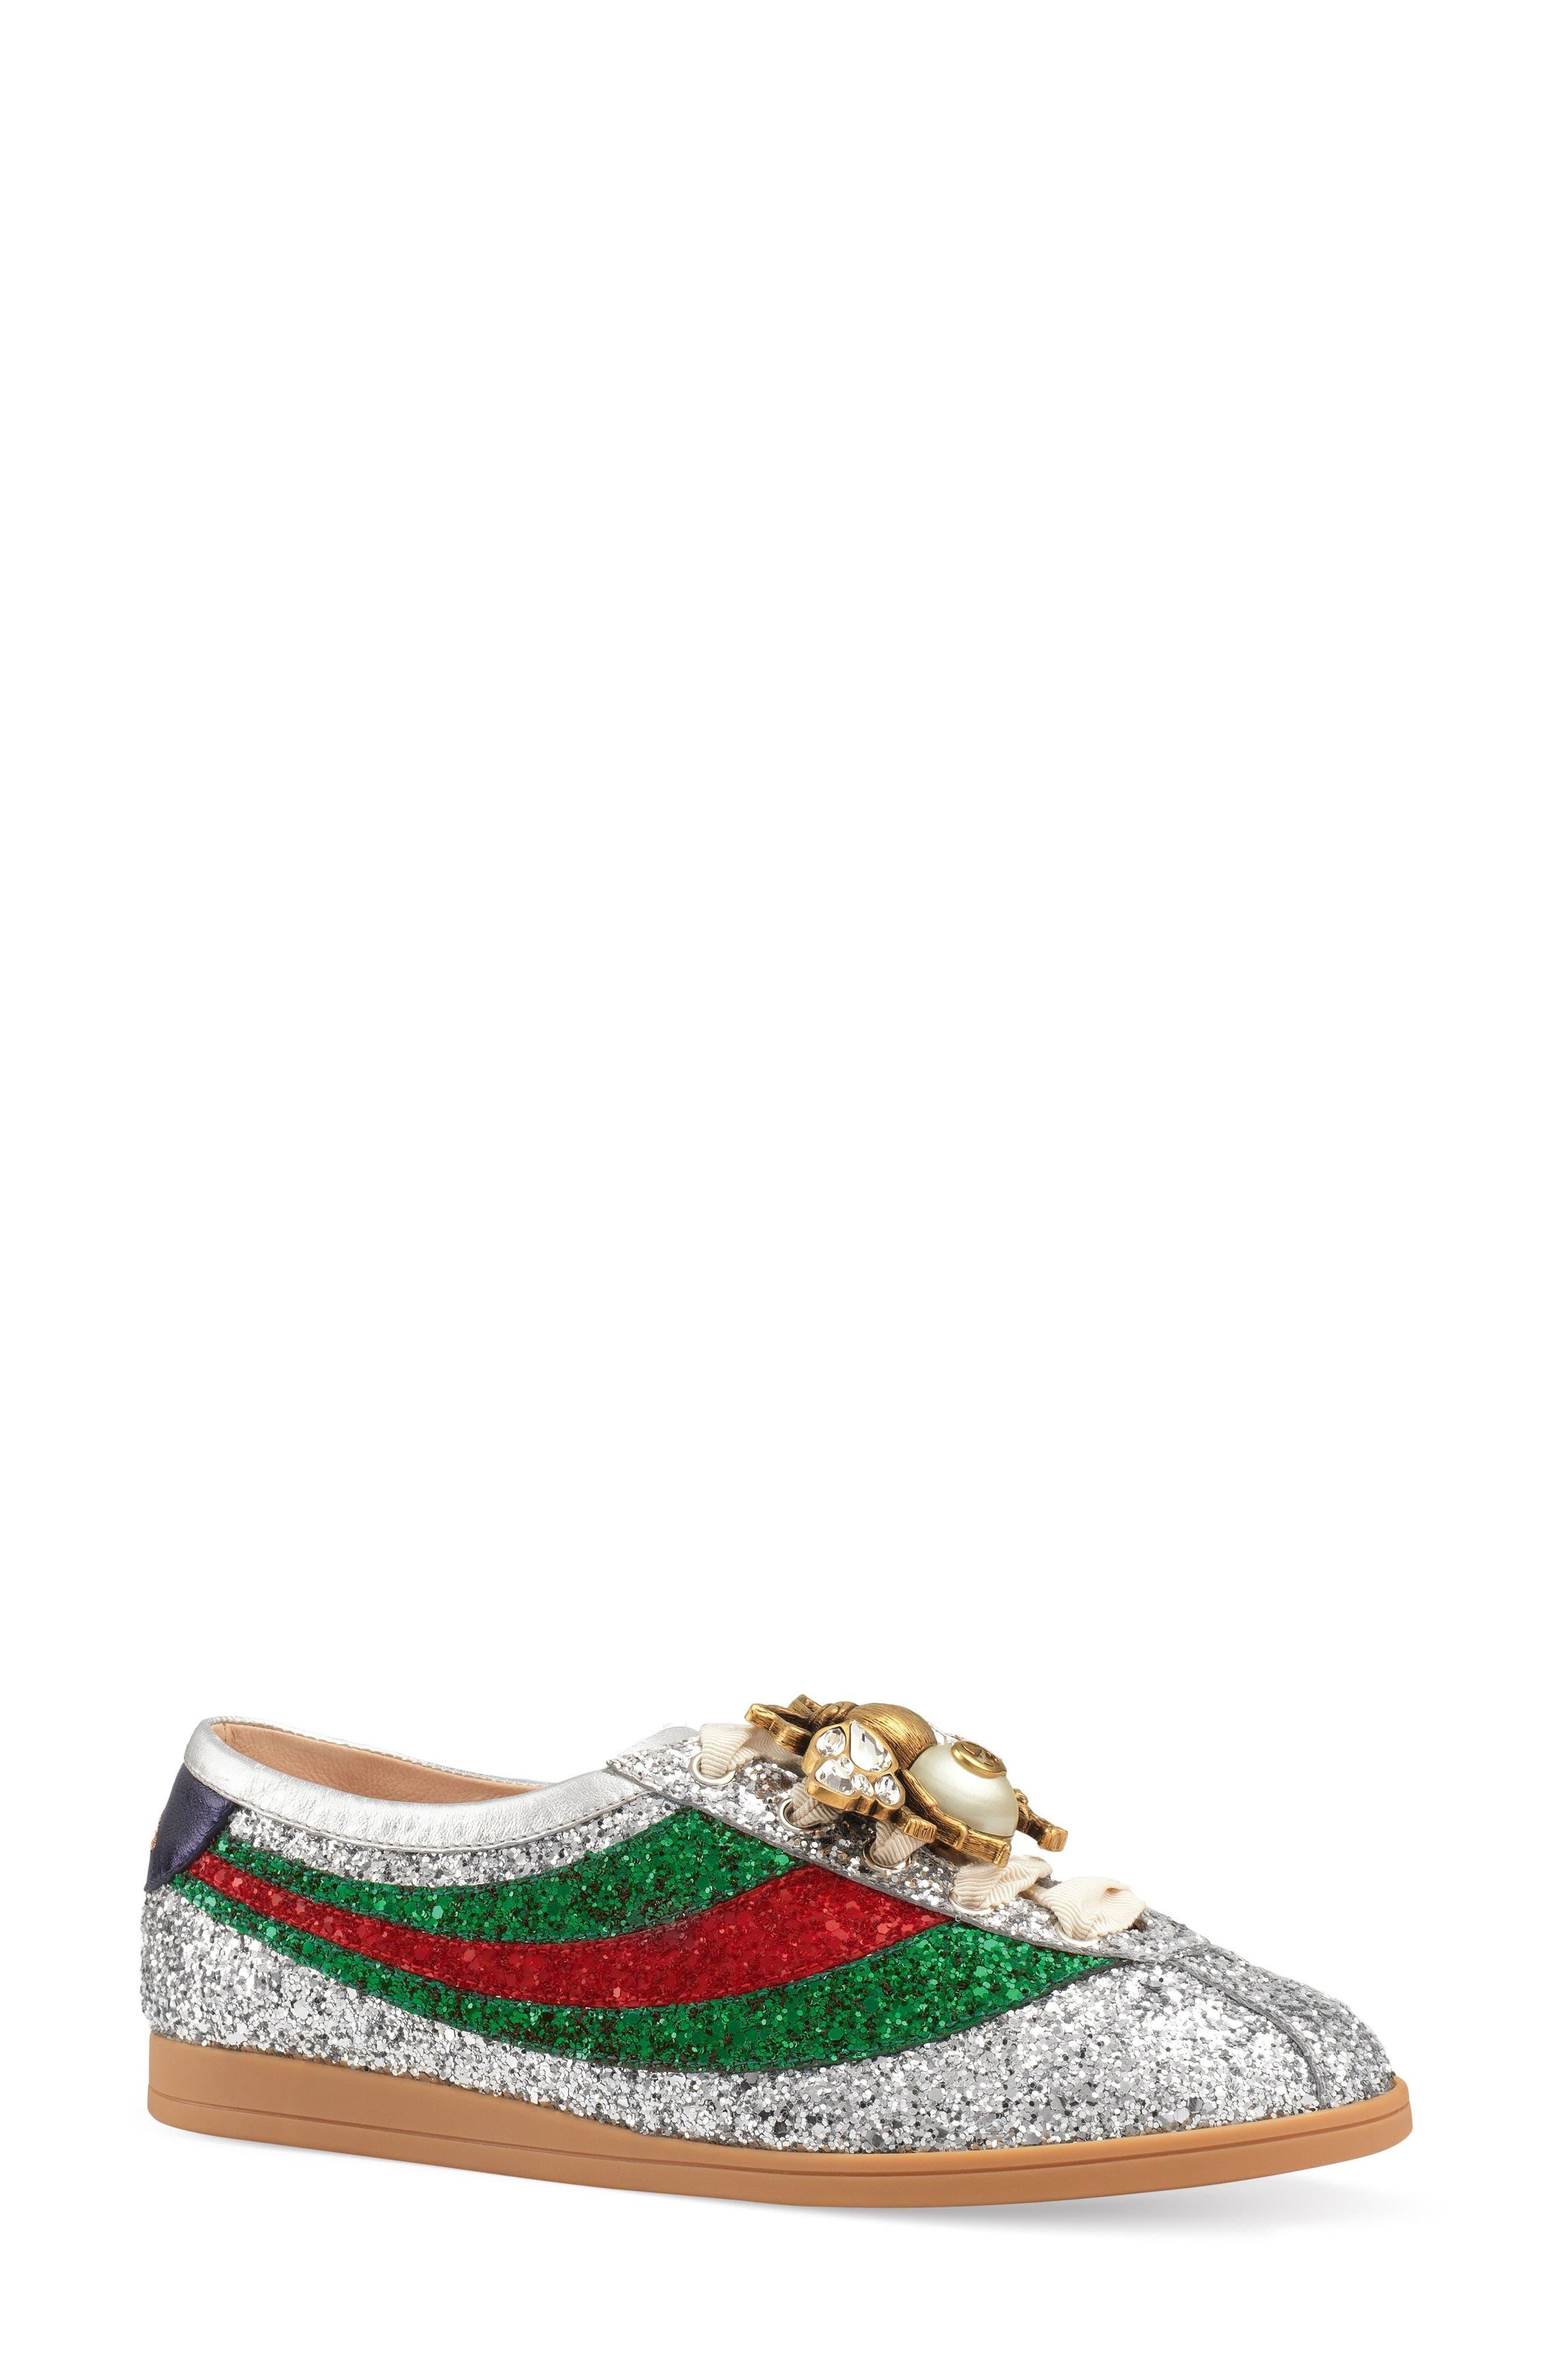 Falacer Glitter Sneaker,                         Main,                         color, 040